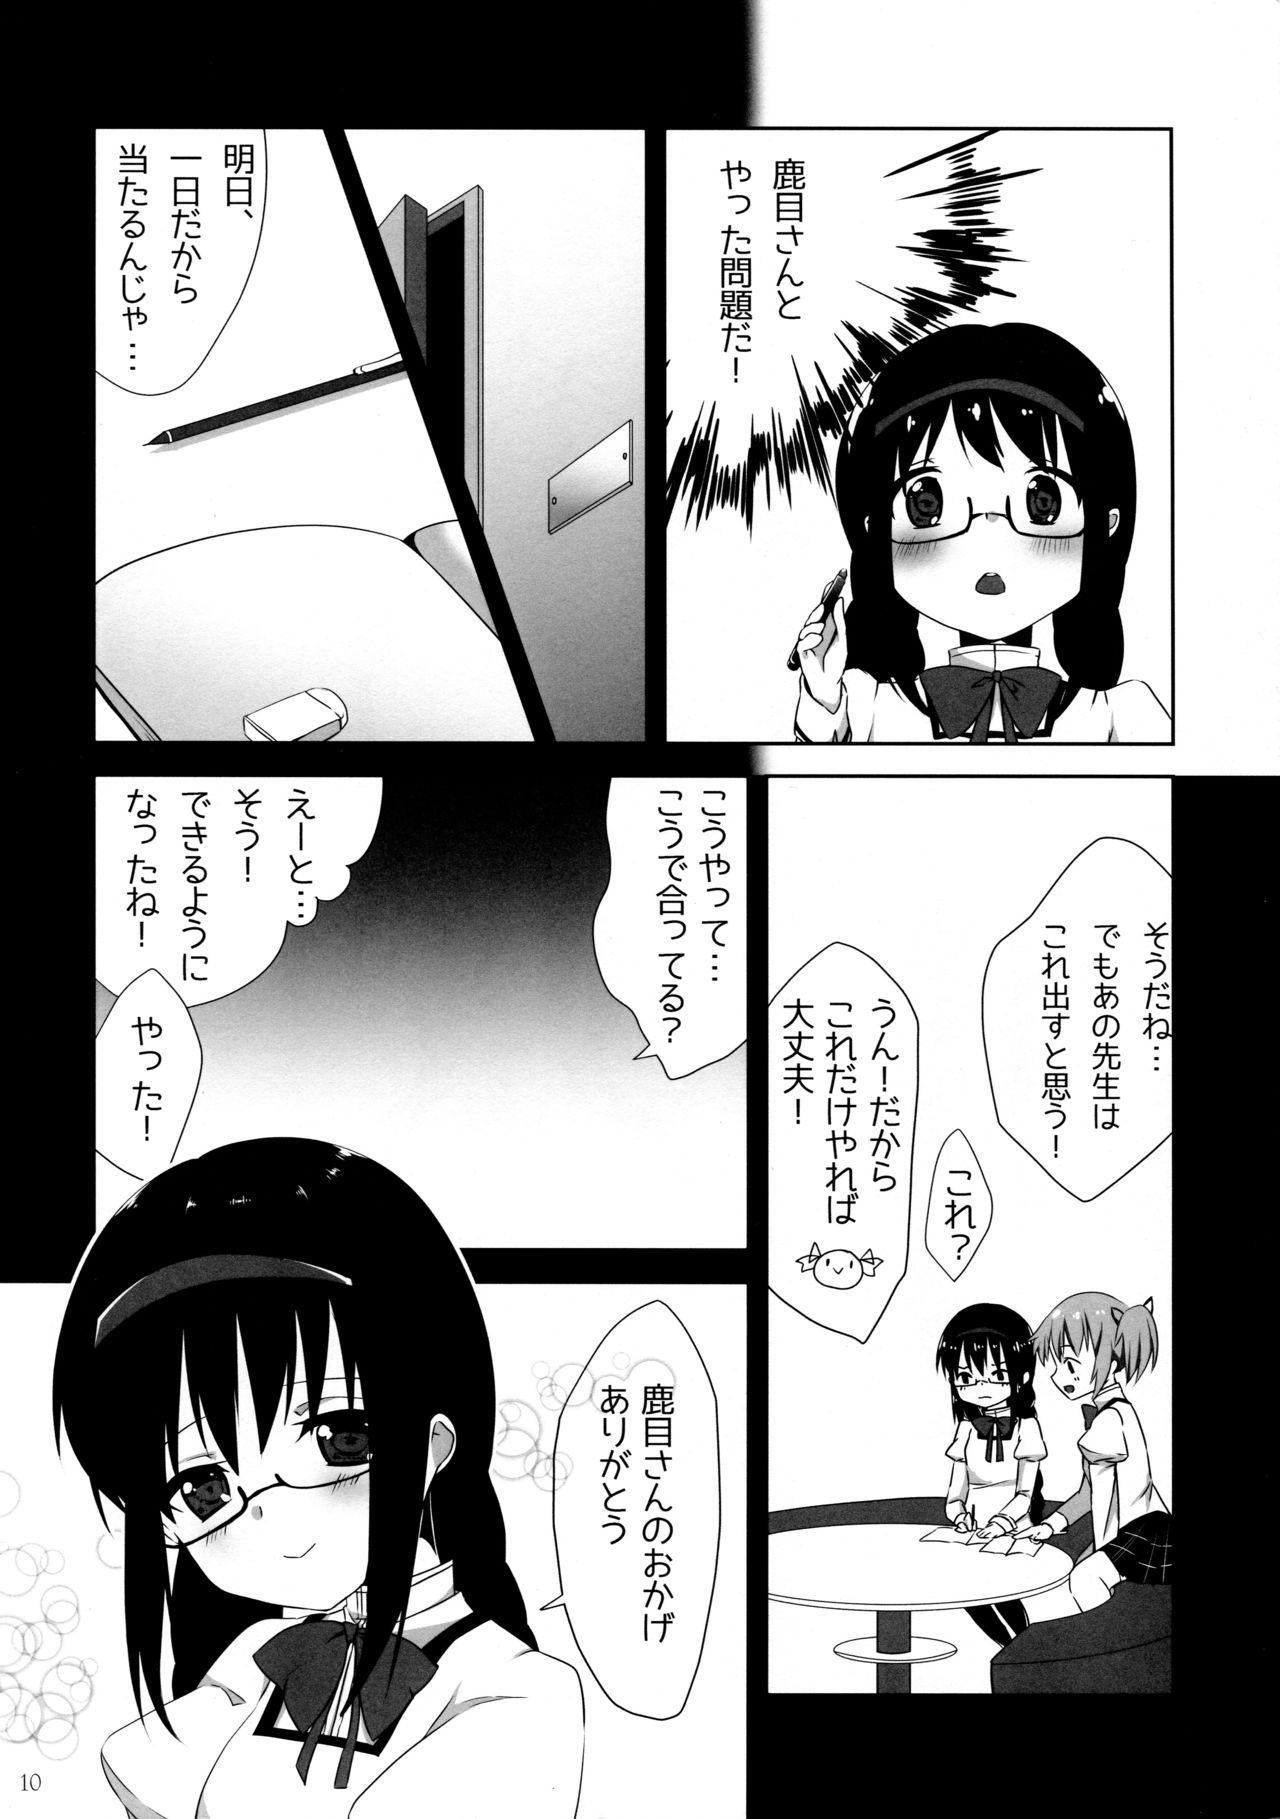 Otome Koichigo - a sweetest strawberry 10